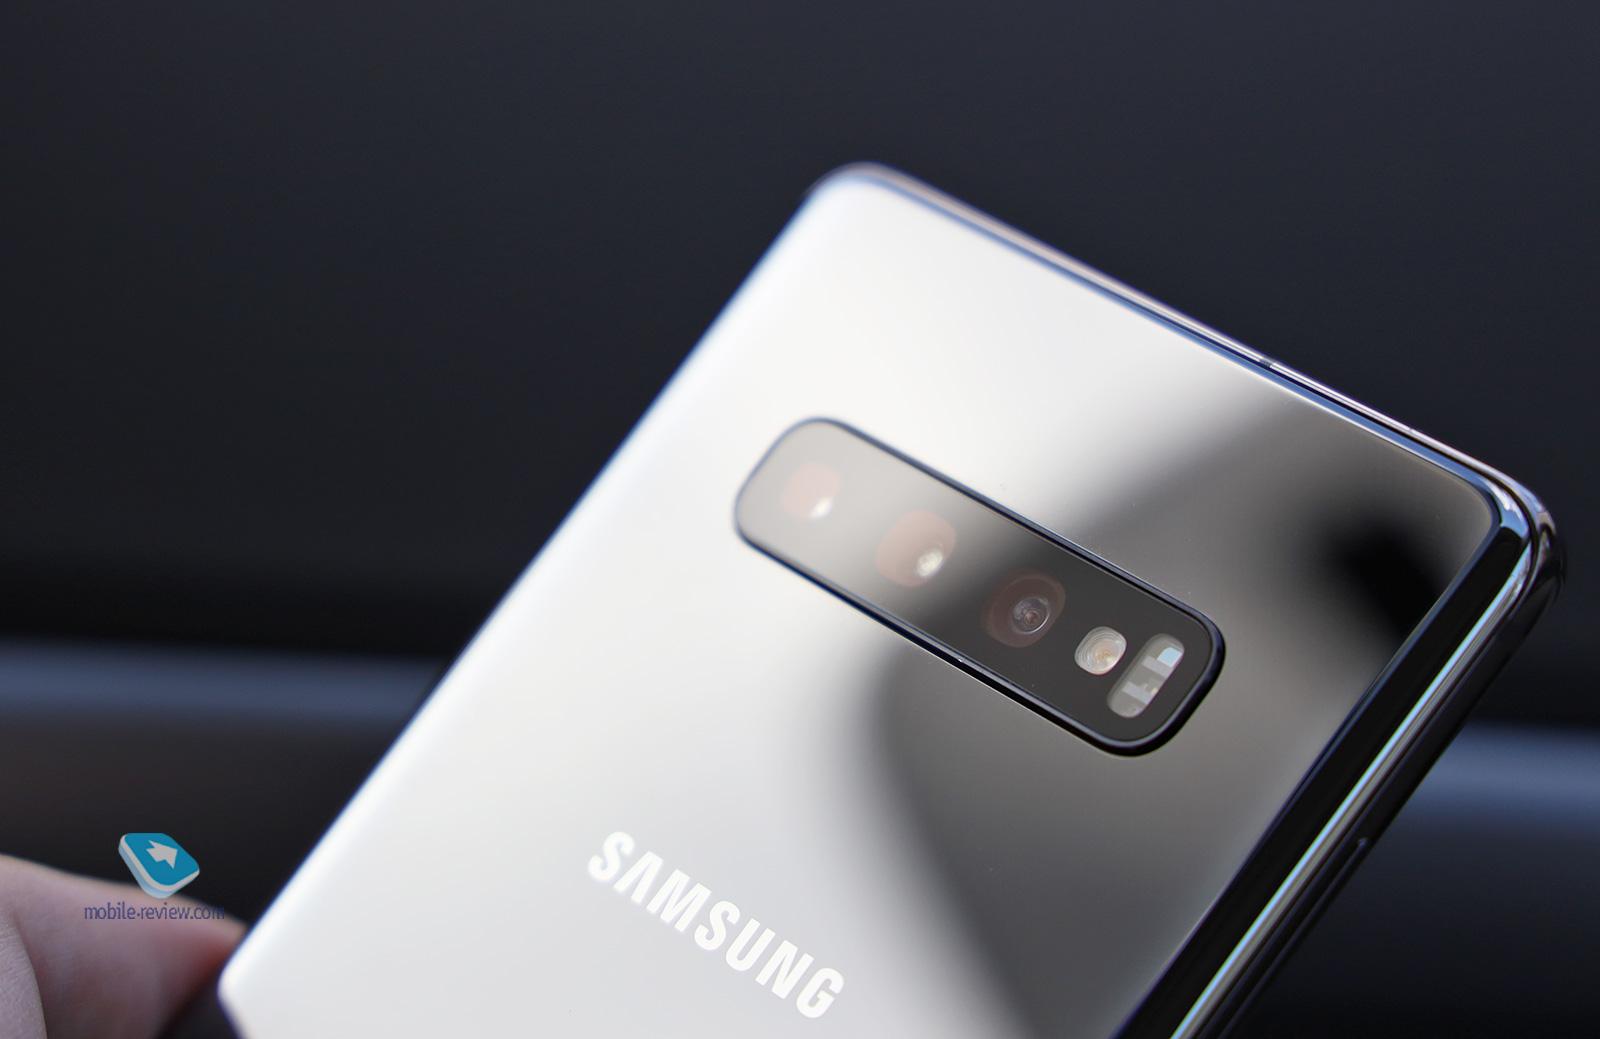 372826d18ded9 Mobile-review.com Обзор камер во флагманах Samsung – Galaxy S10e/S10 ...